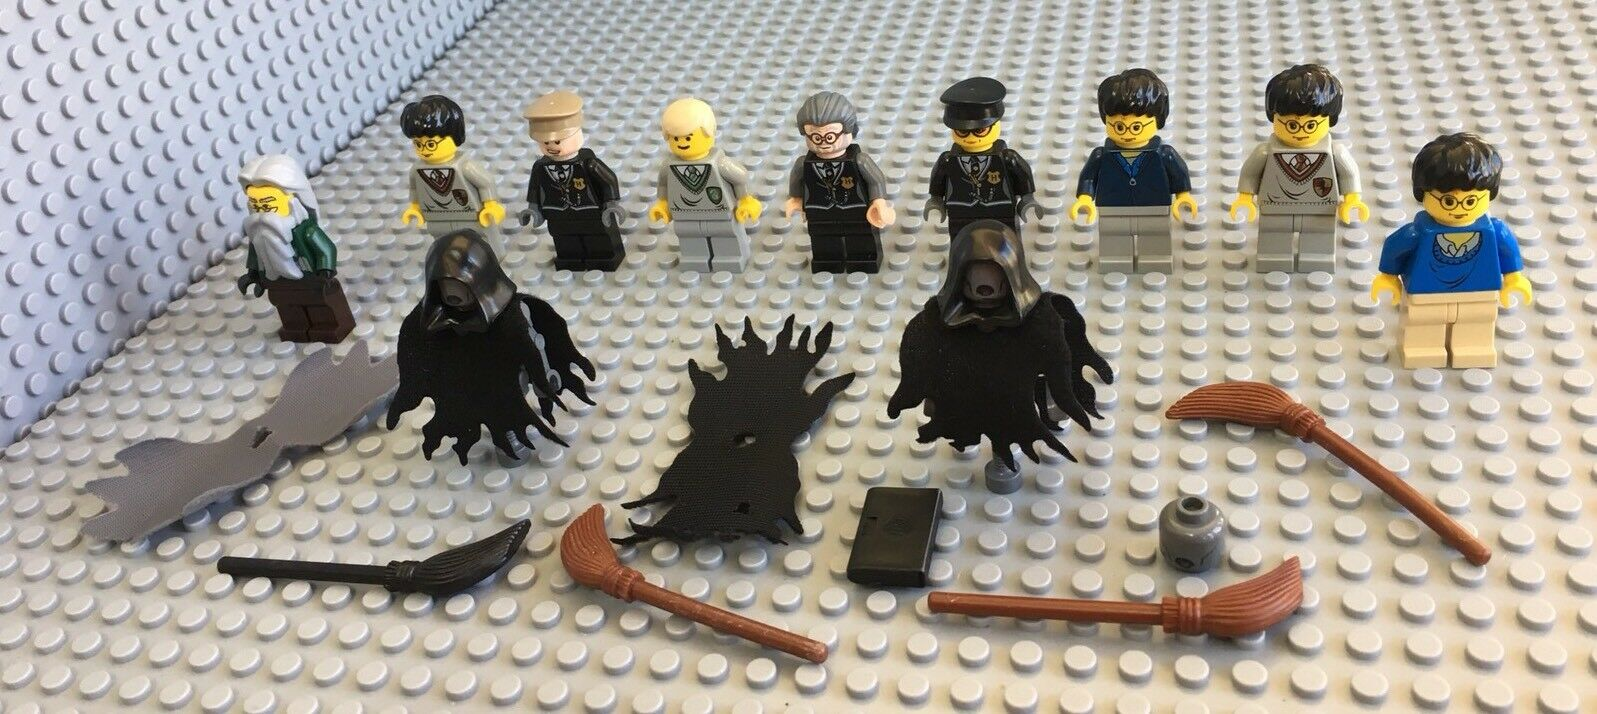 LEGO 9 HARRY POTTER Mini Figures Accessoires MIXED figures Poudlard